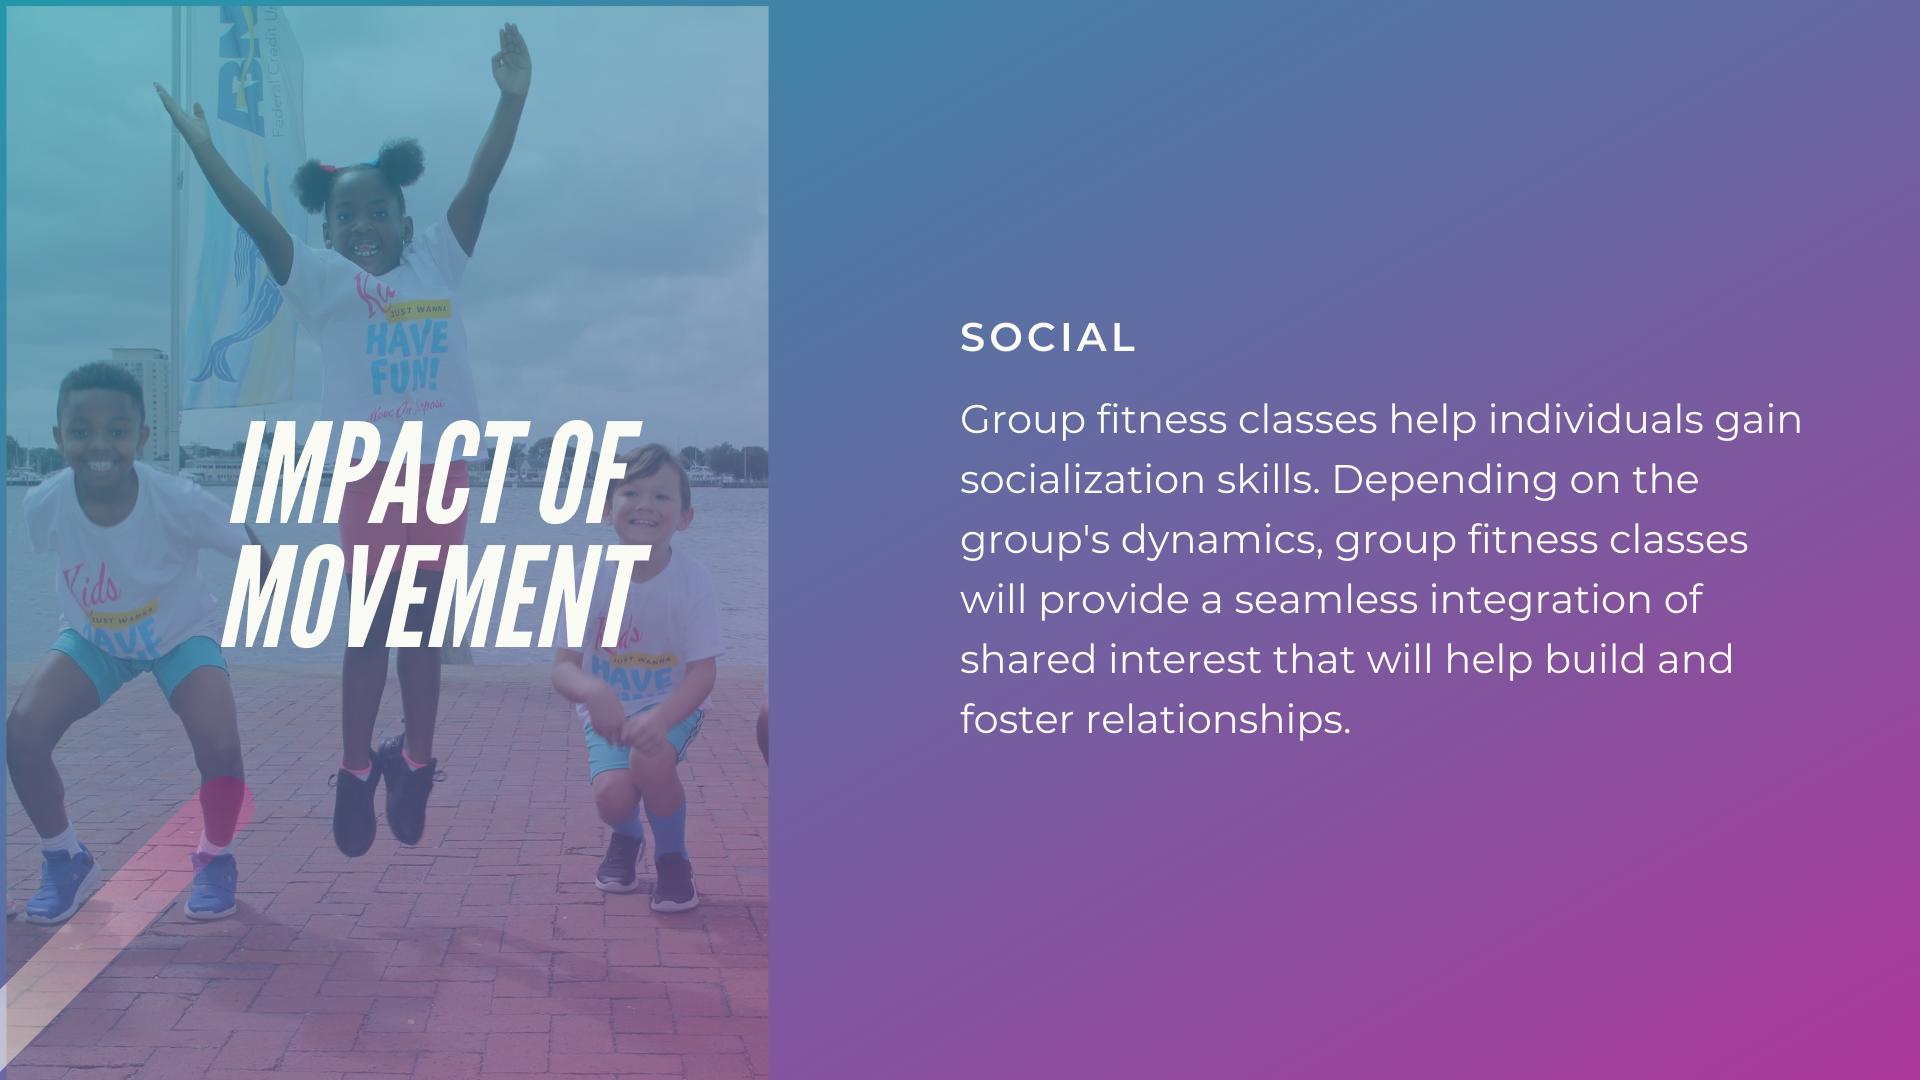 NMF-web-content-impact_social (2).png